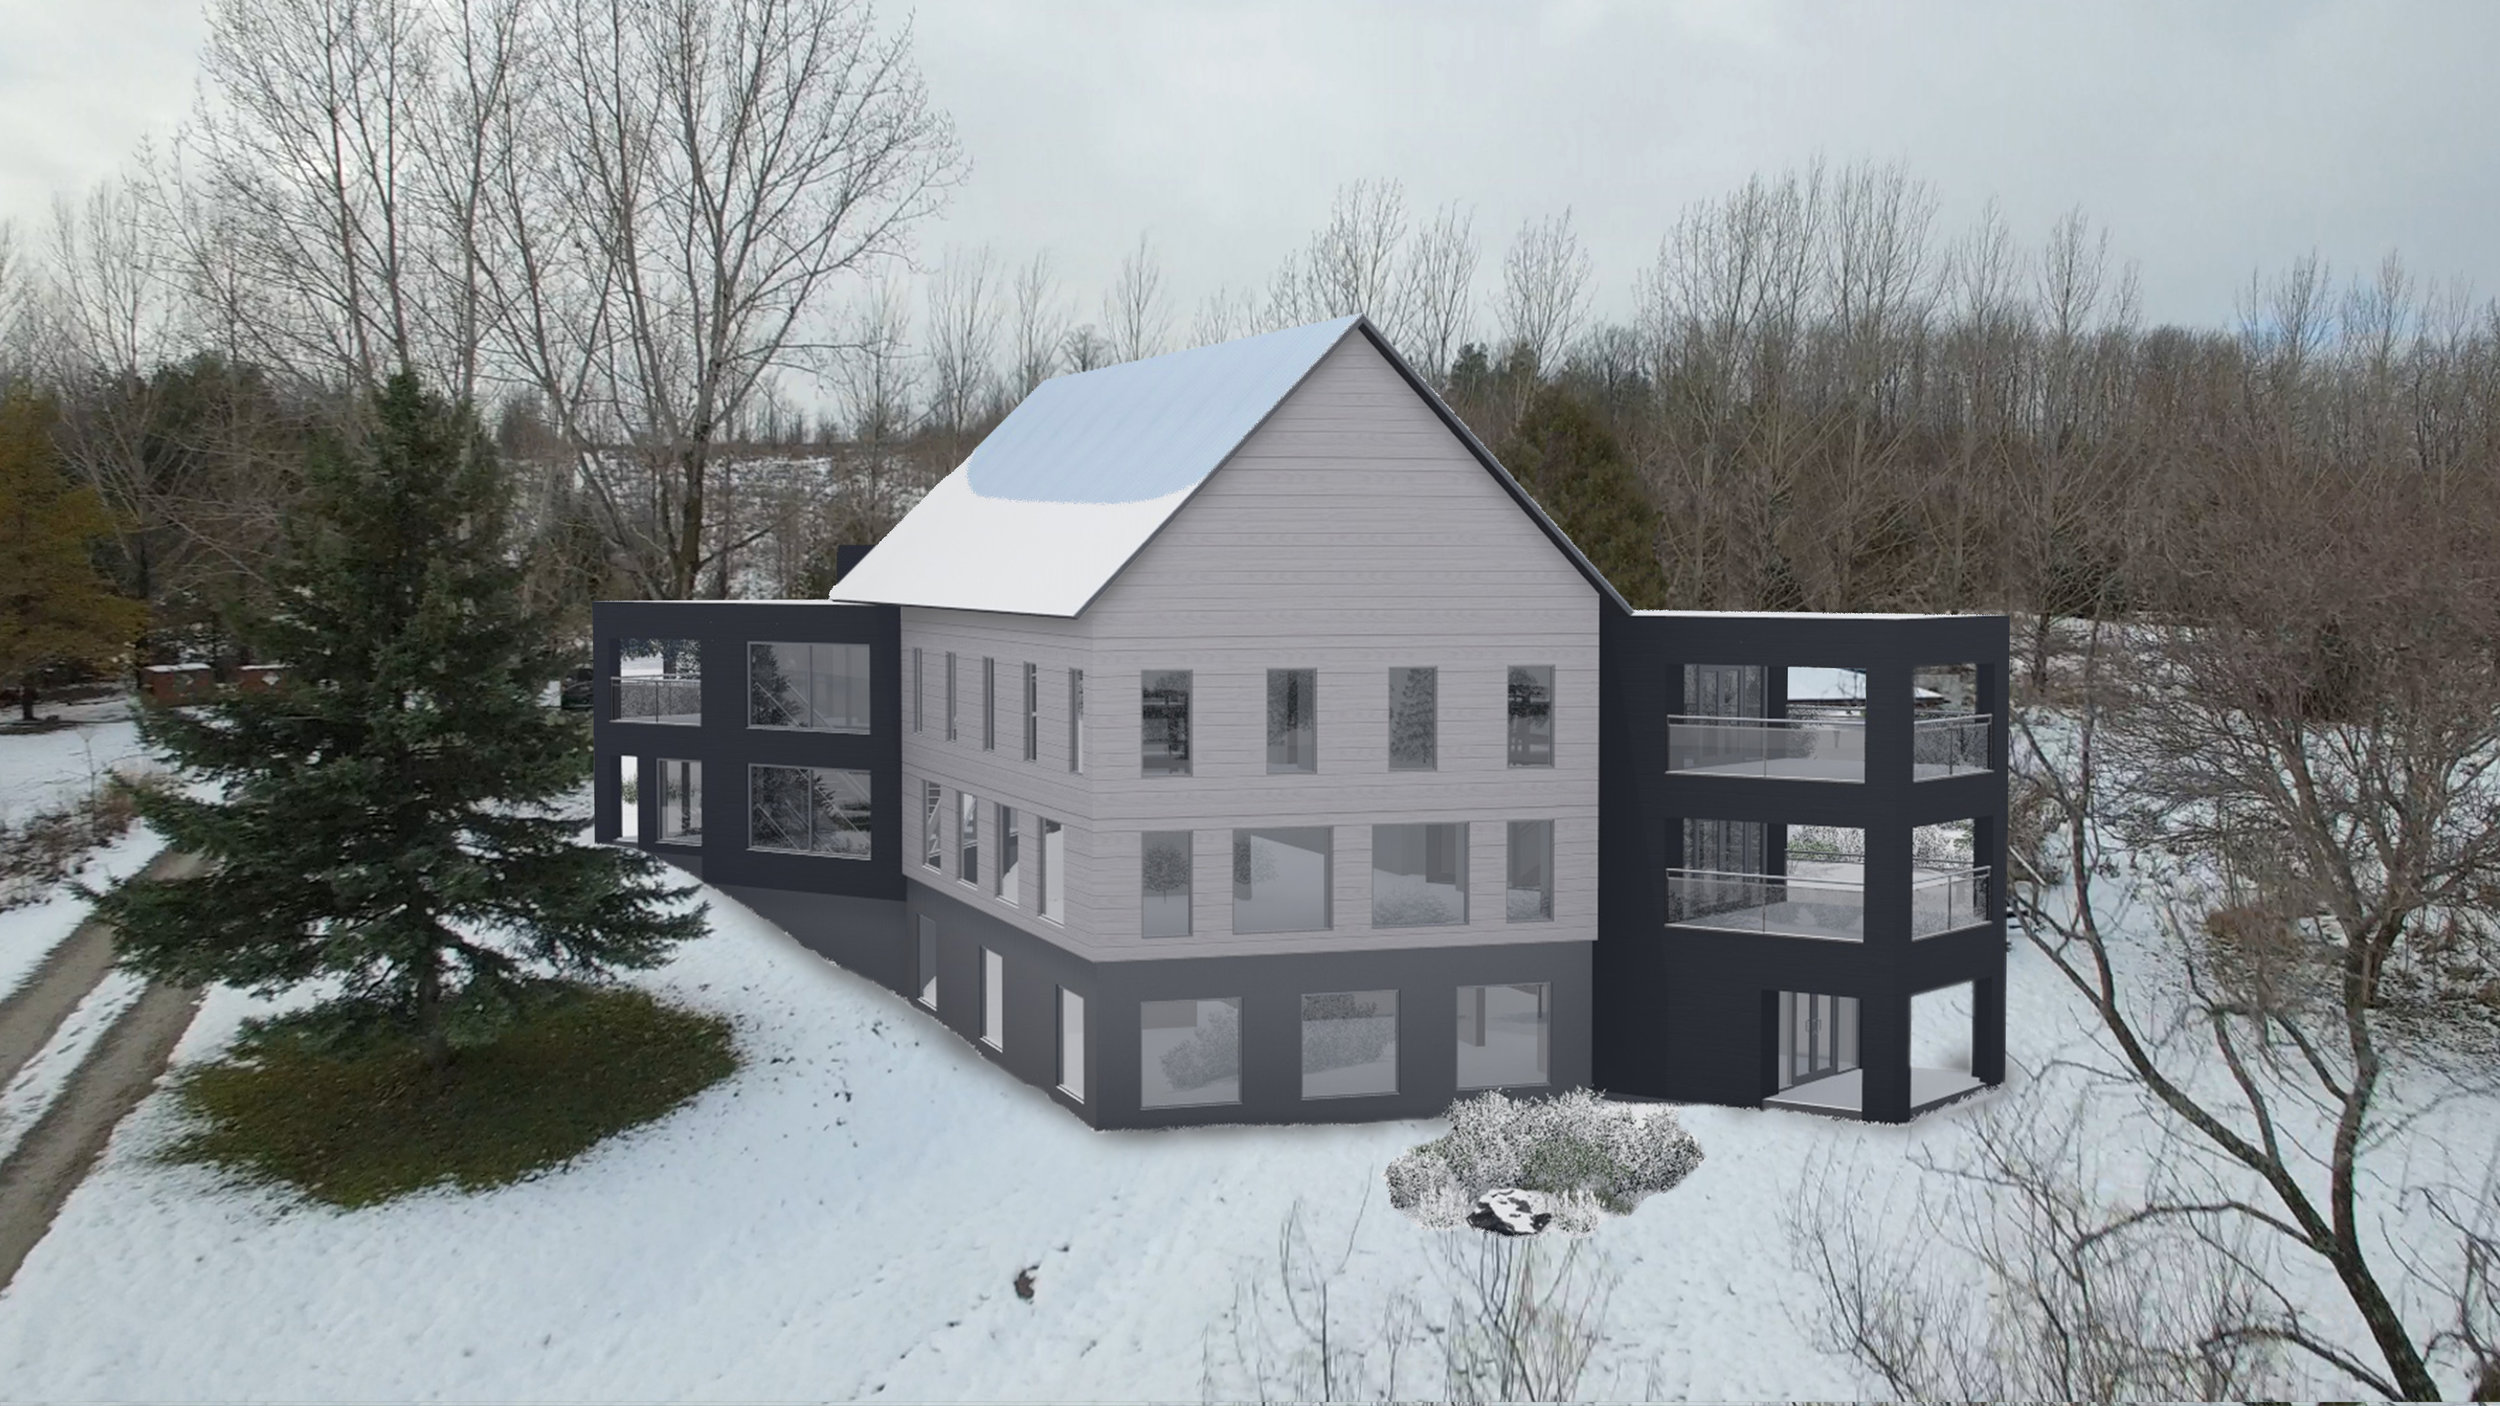 Kimbercote Accommodations Building - 011B1.jpg